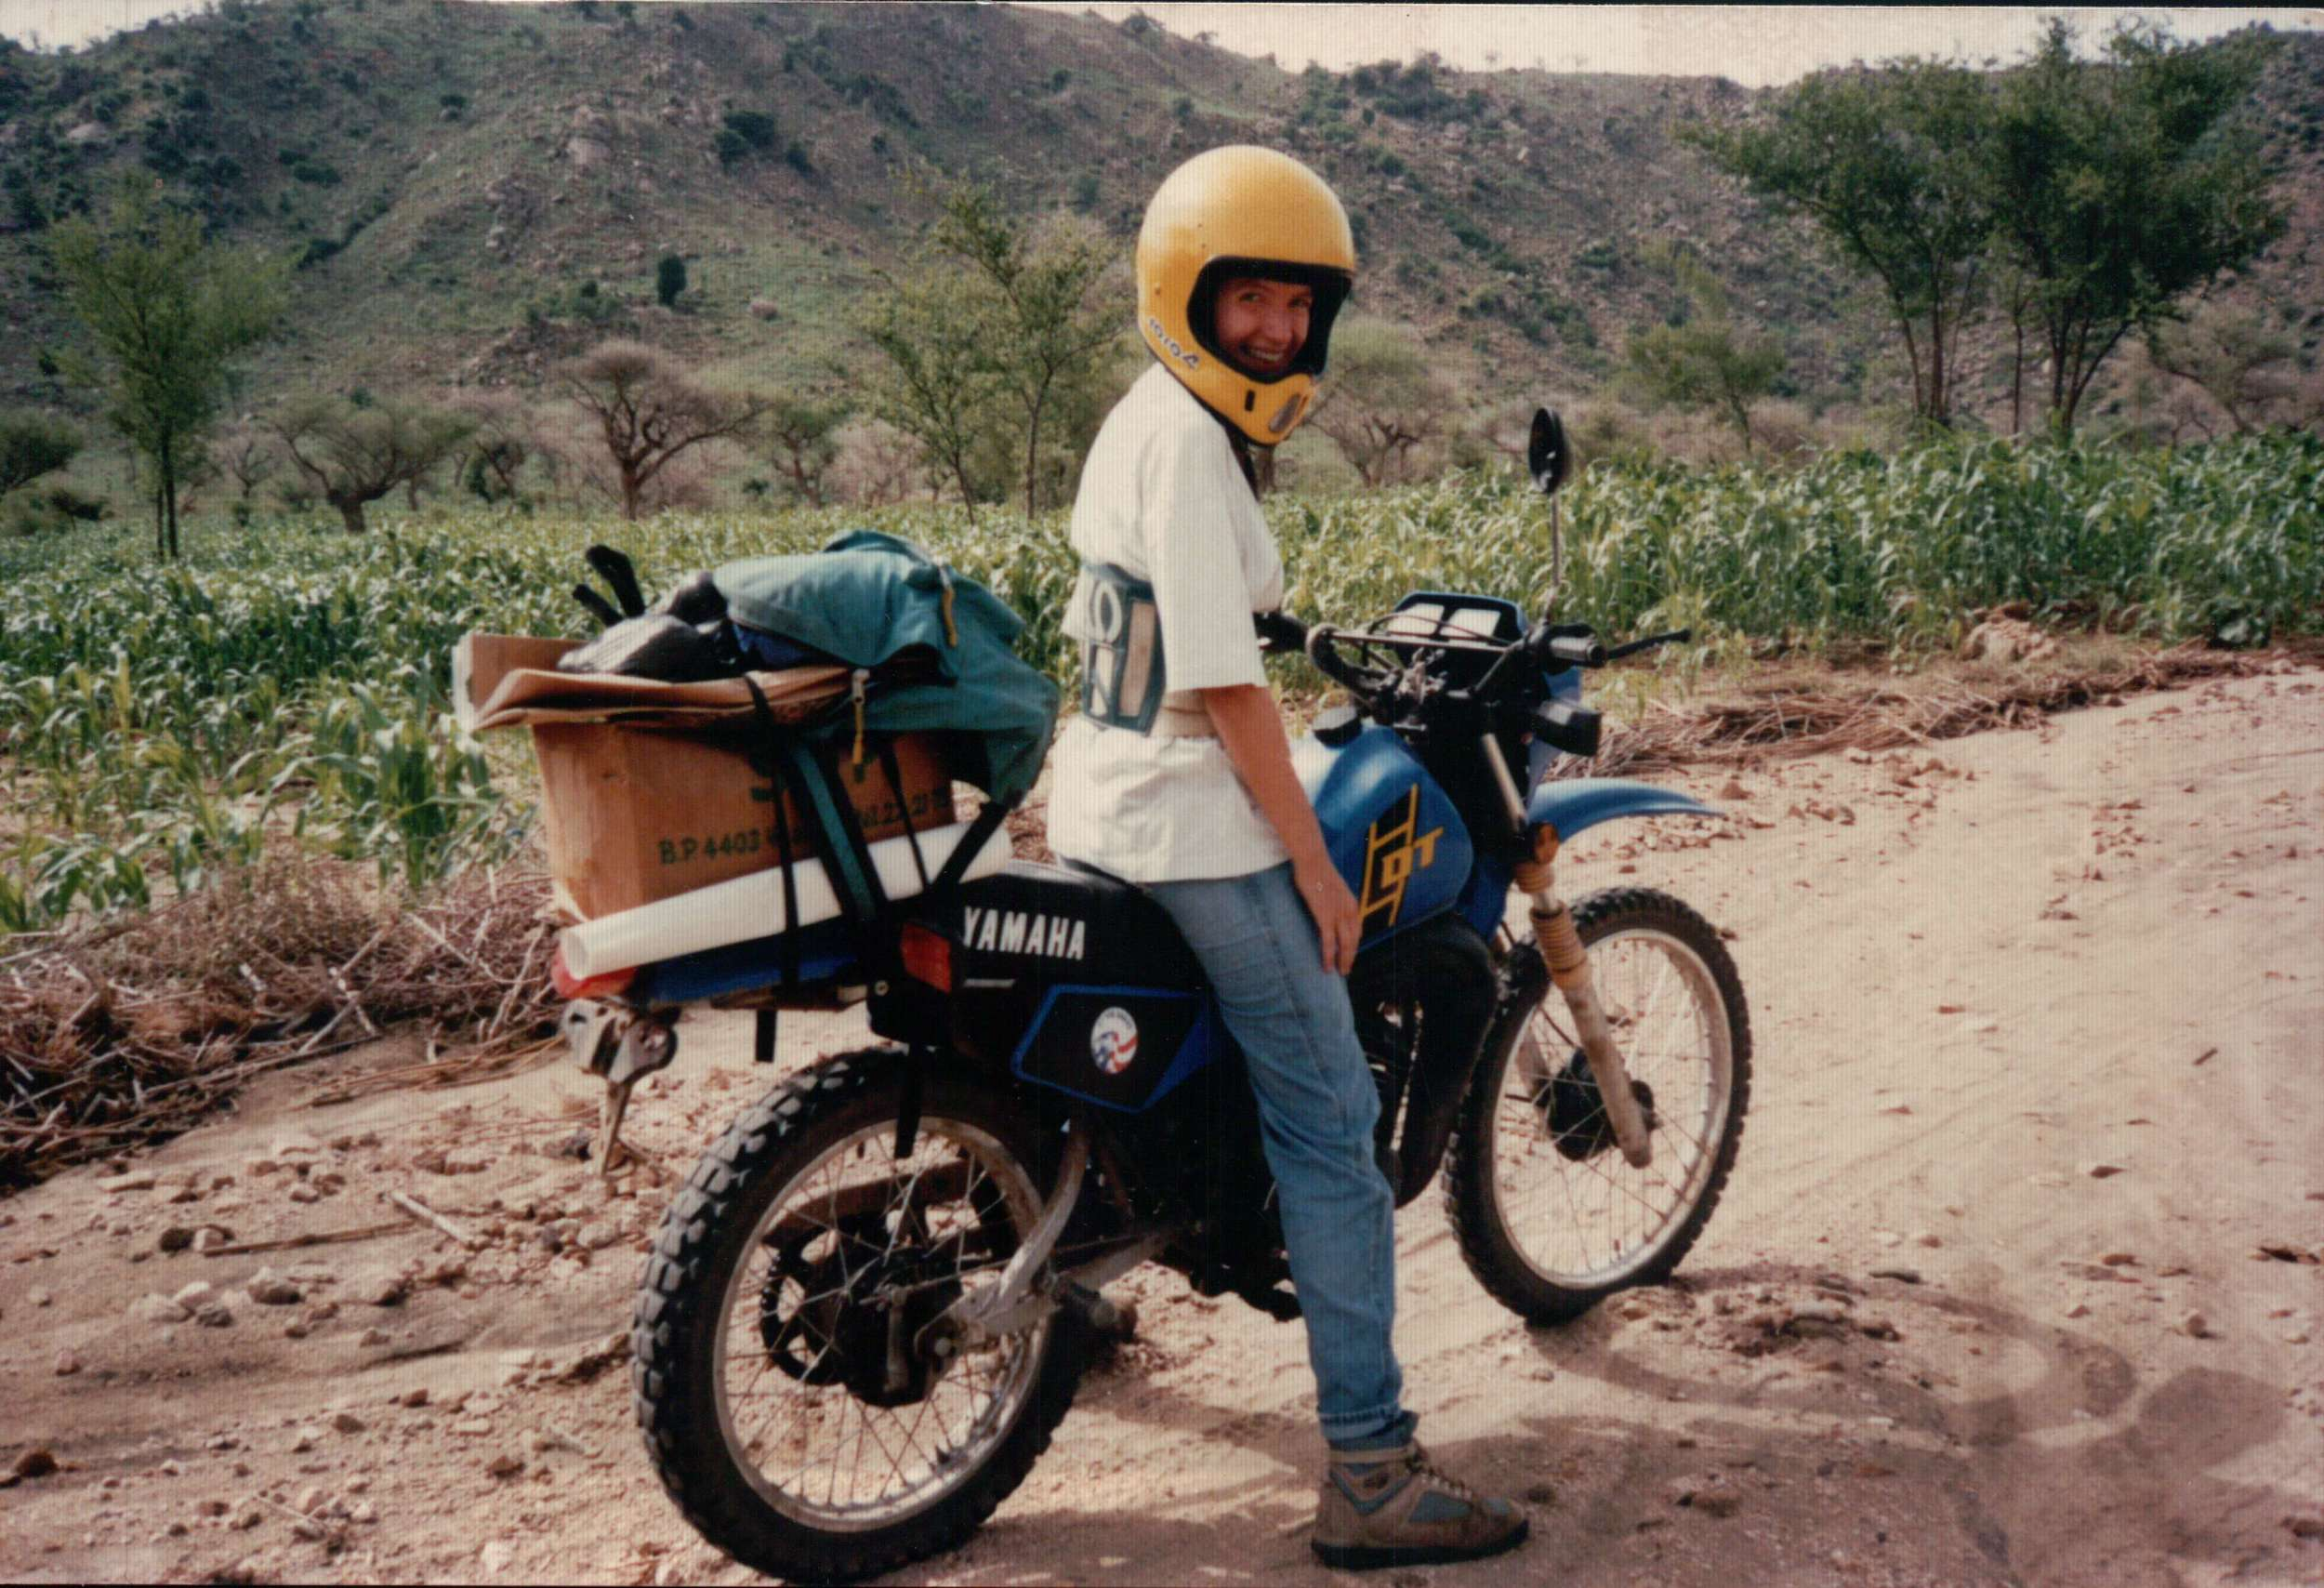 Susan riding a motorbike